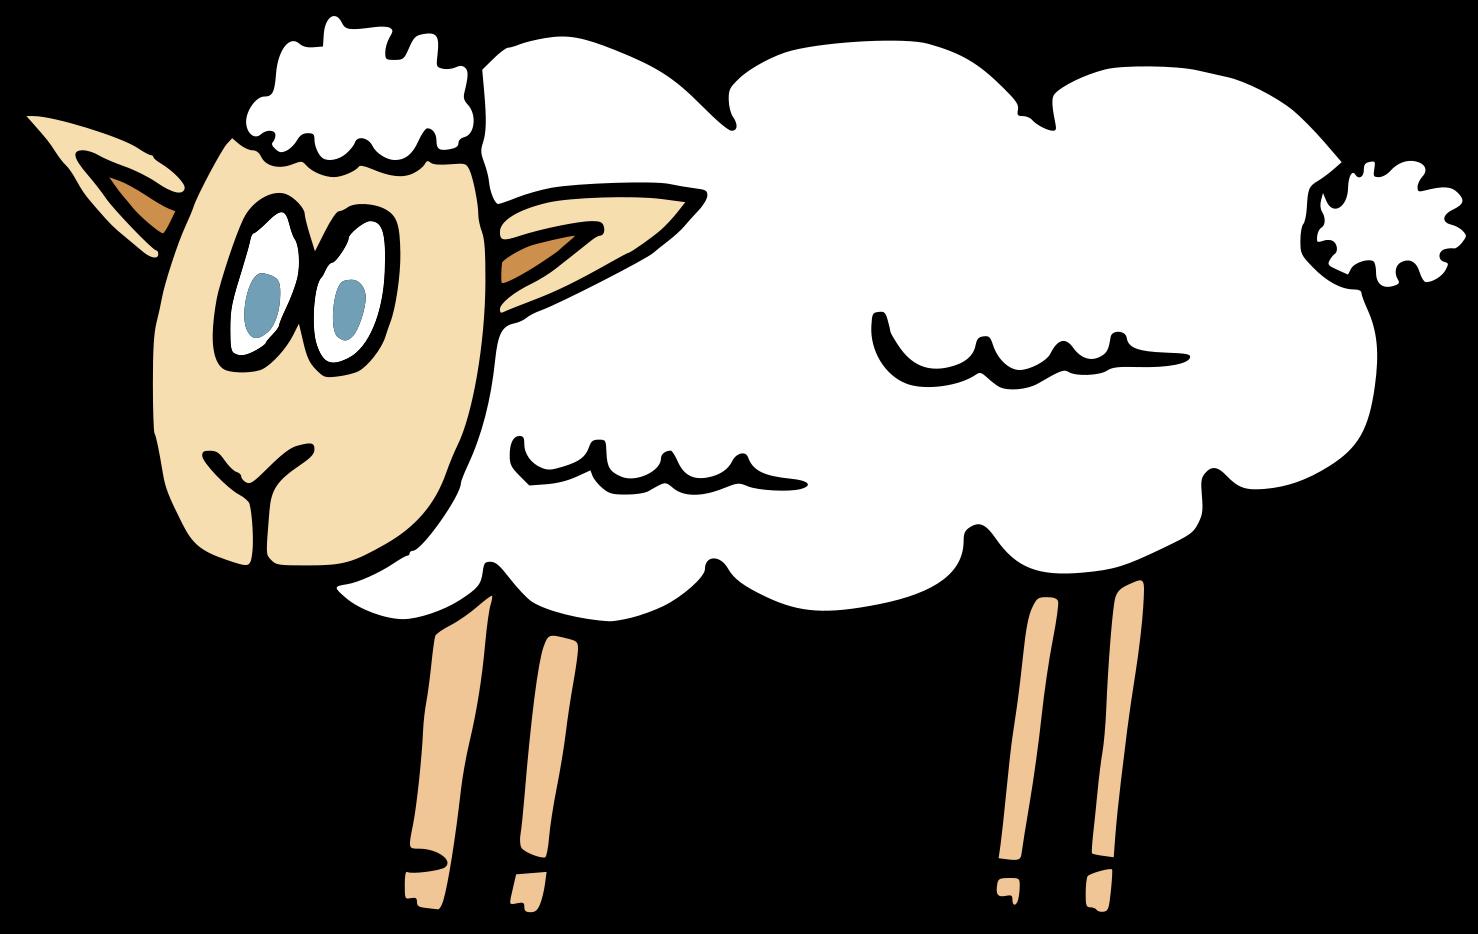 cartoon-sheep-5.png